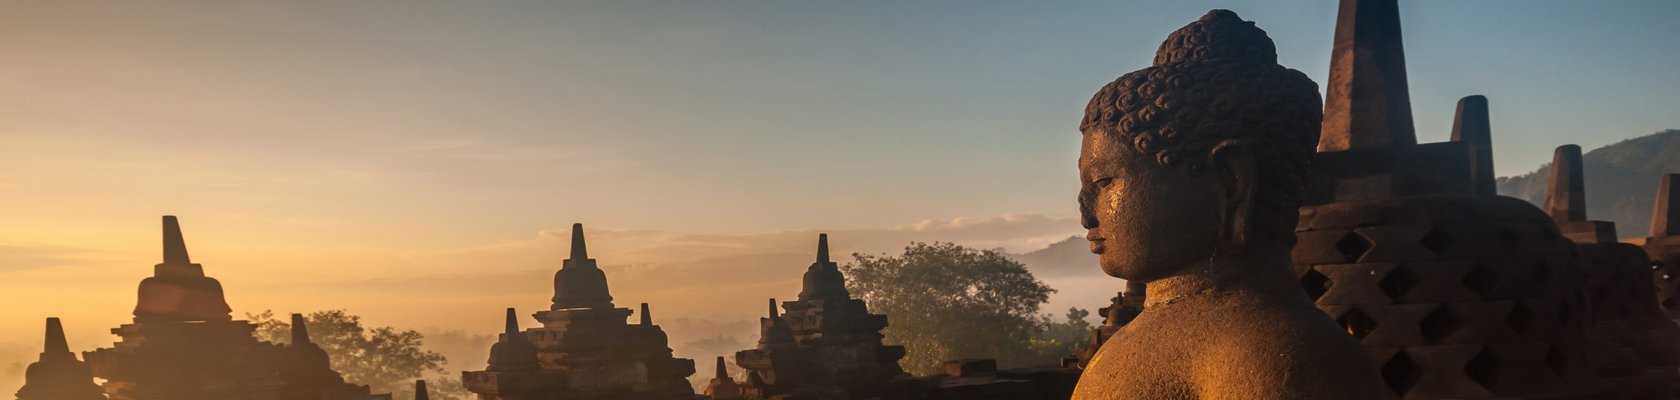 Borobudur, Jogjakarta